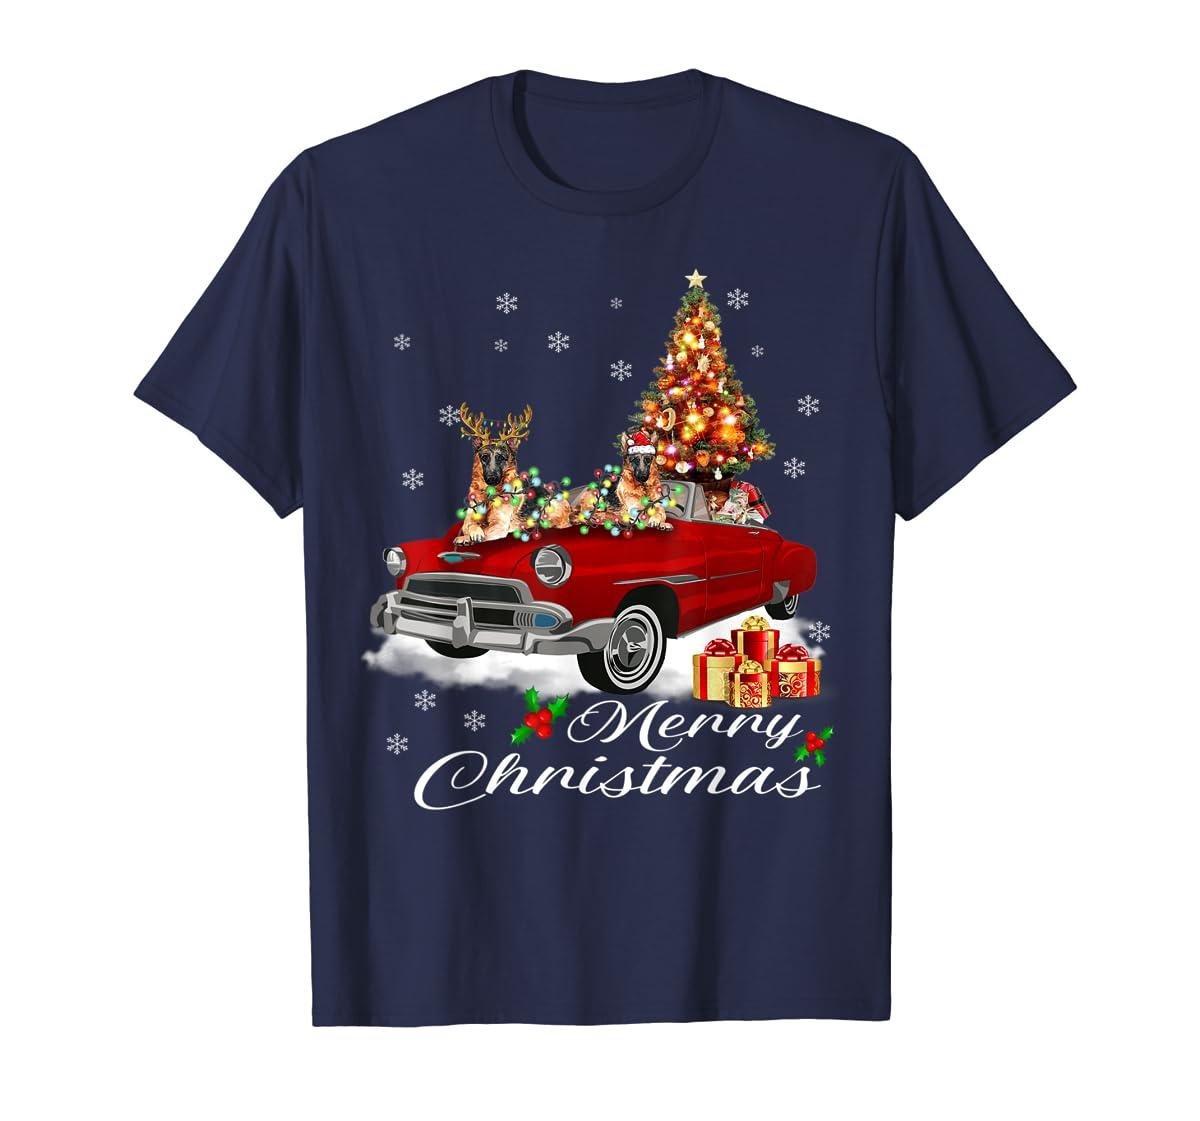 German Shepherd on Red Truck Christmas Pajama Dog Lover Gift T-Shirt-Men's T-Shirt-Navy